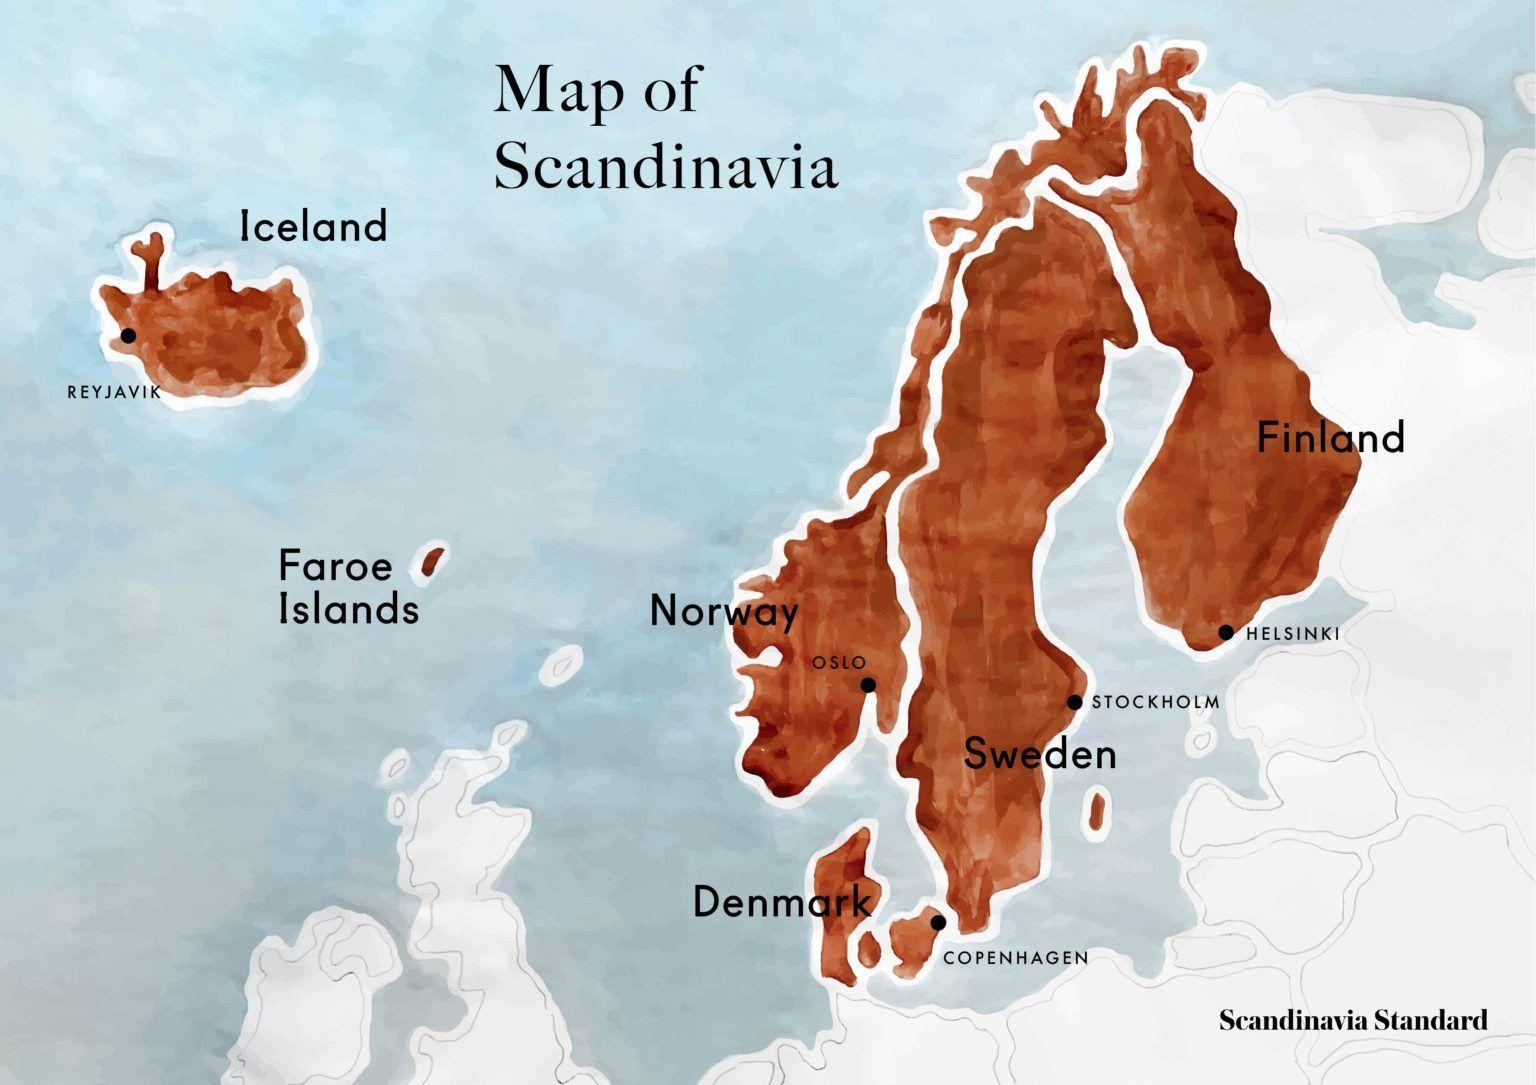 Discover The Best Maps Of Scandinavia Chrisann Timbie Discover The Best Maps Of Scandinavia Discover The Best Maps Of Scandinavia Chrisann Disc I 2020